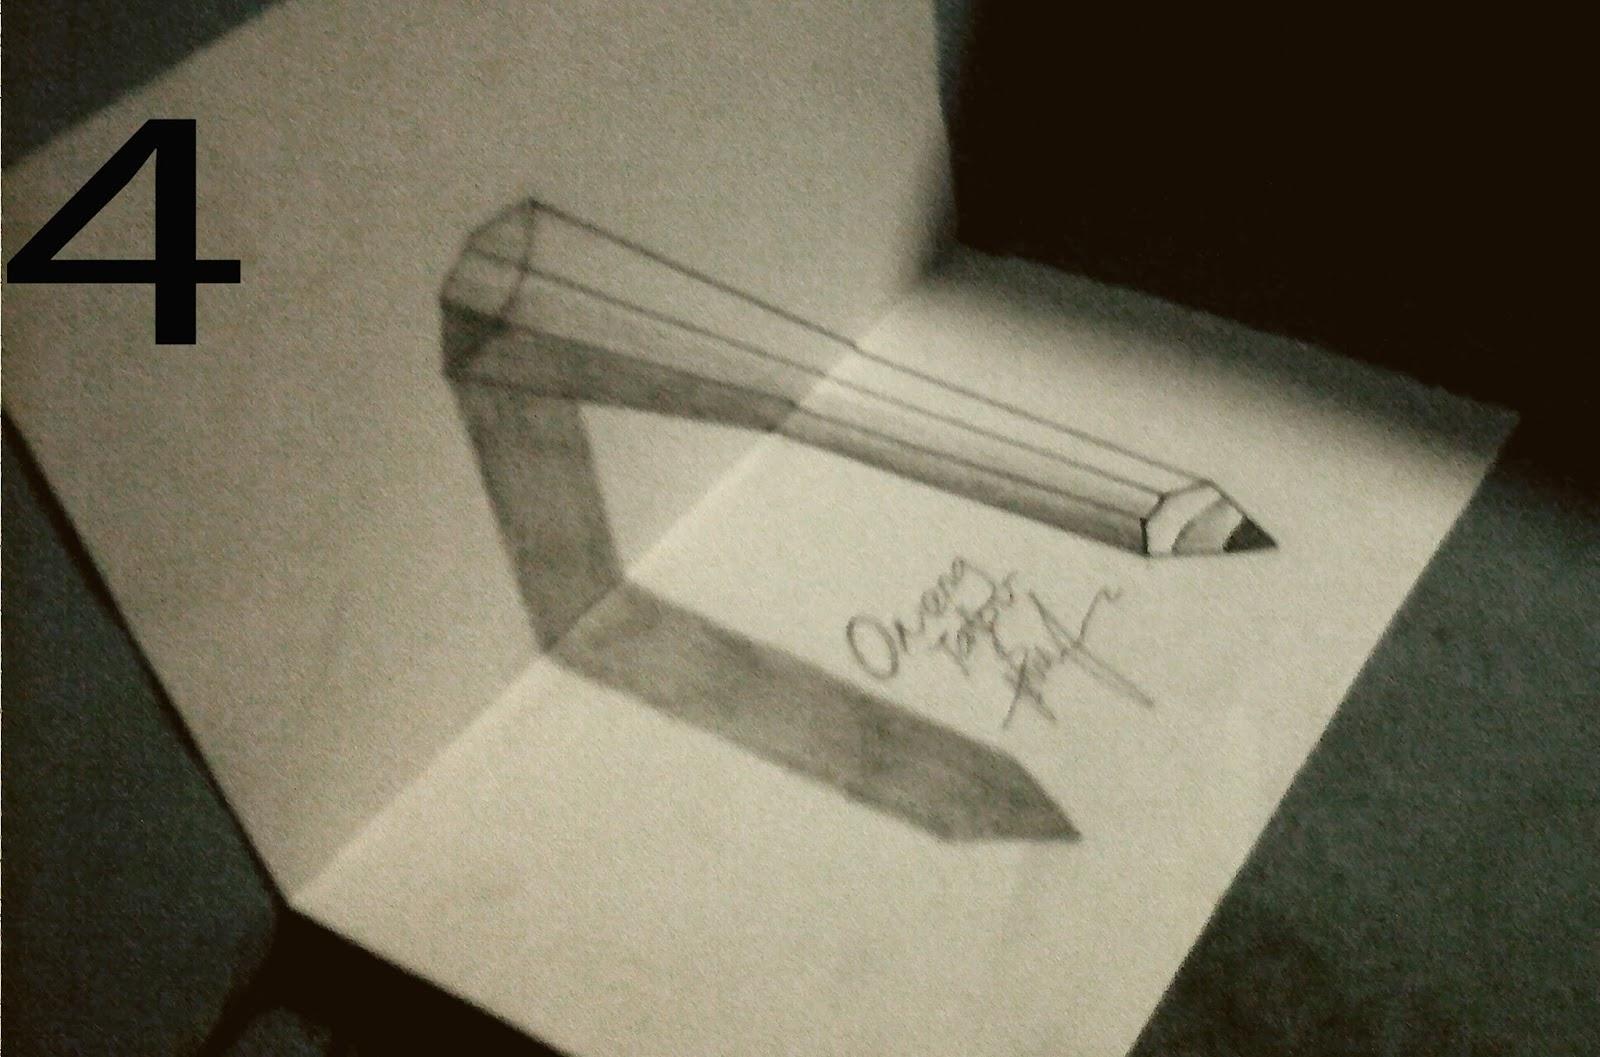 Kumpulan Workshop Gambar Sketsa Pensil